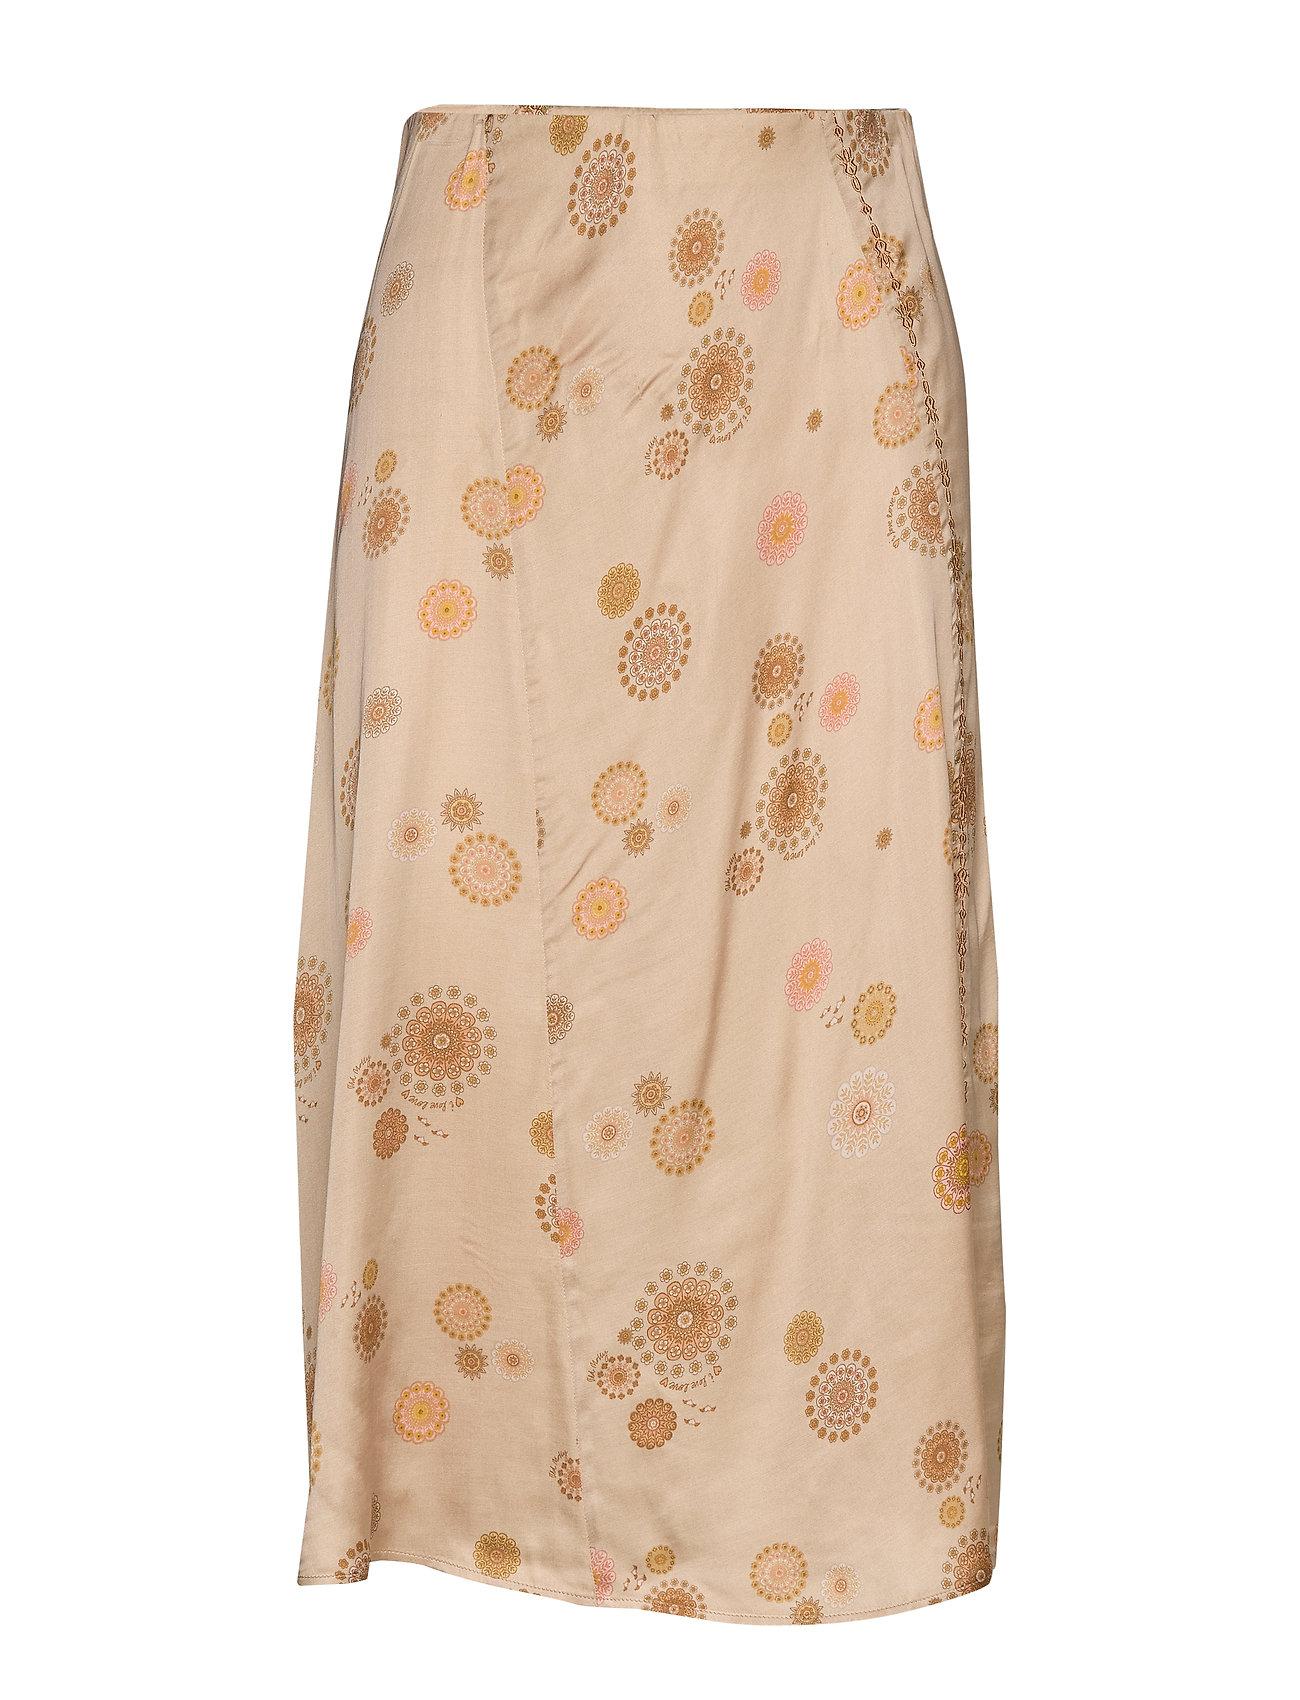 ODD MOLLY Praise This Skirt - LIGHT TAUPE